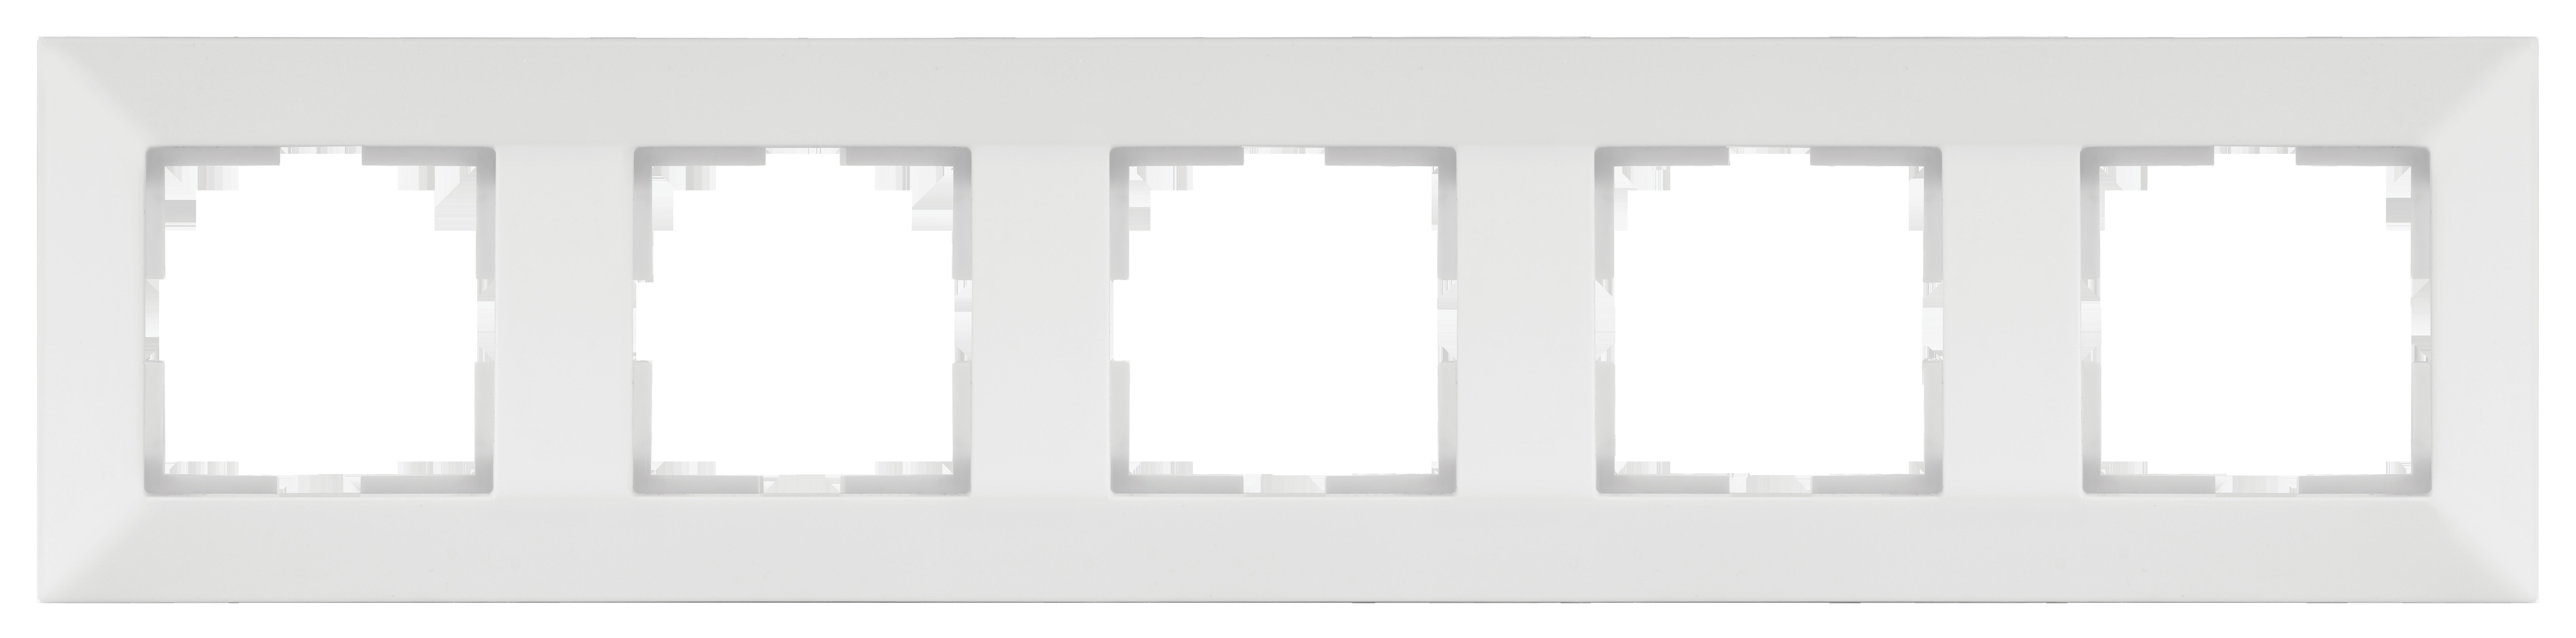 Meridian 5-gang frame